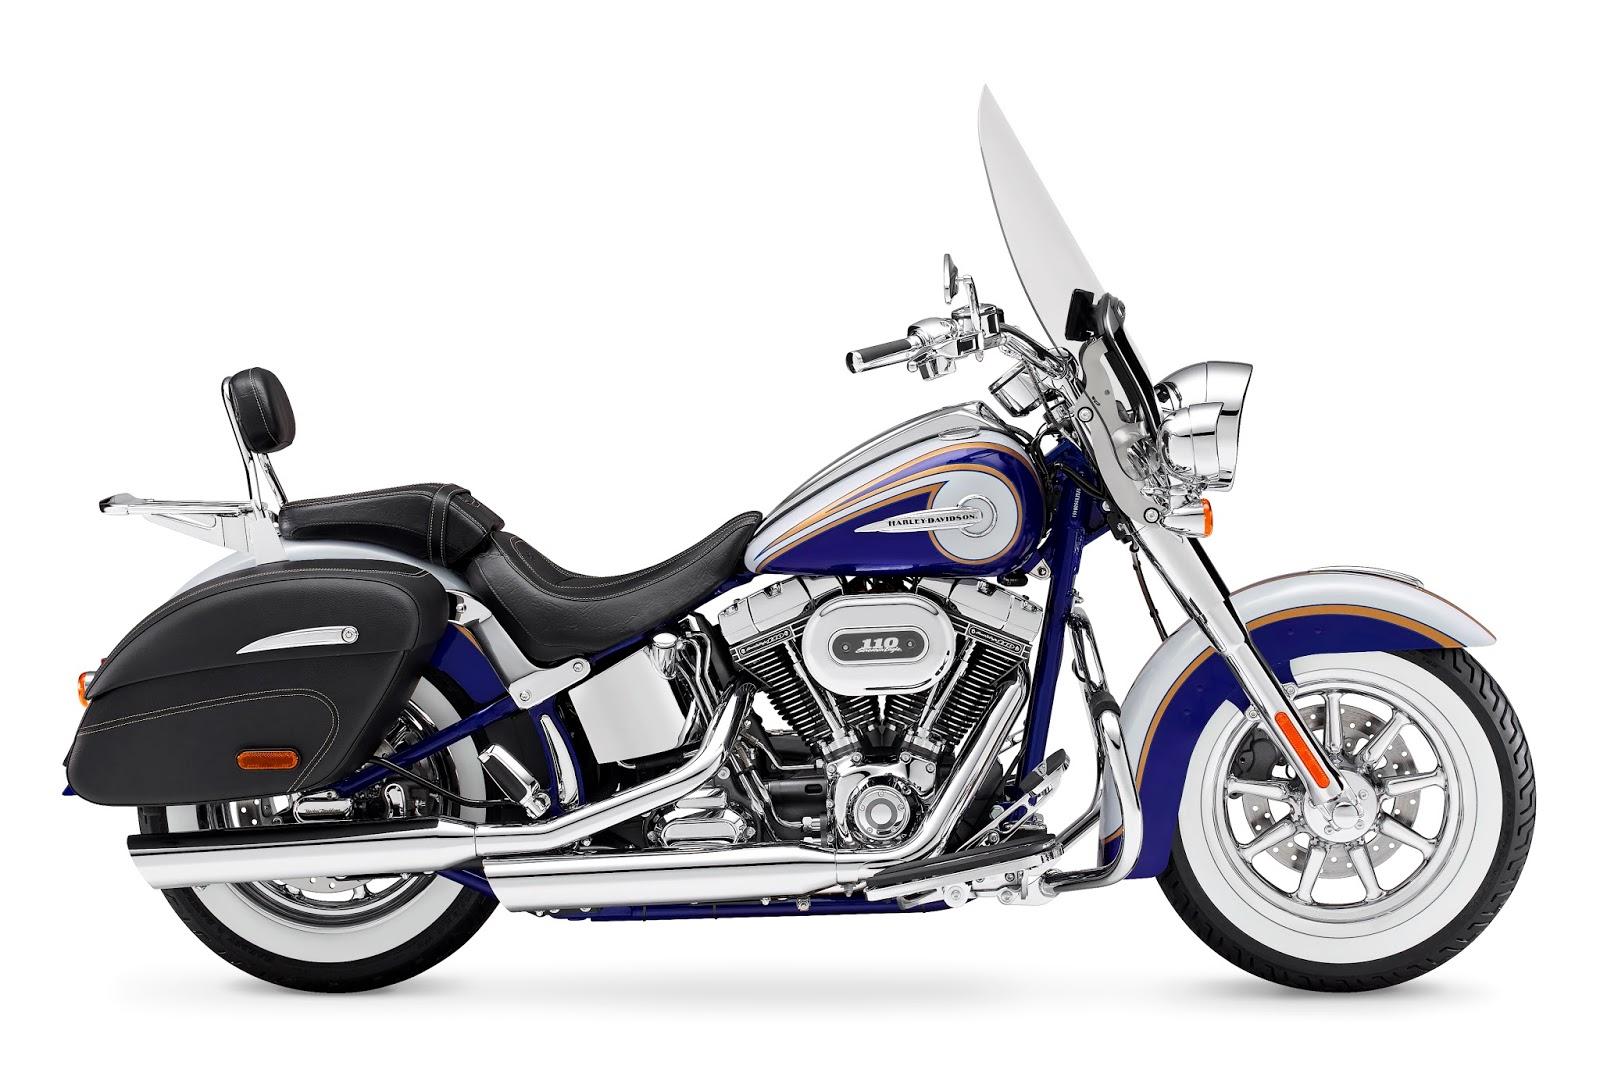 Racing Cafè: HarleyDavidson CVO Softail Deluxe 2014